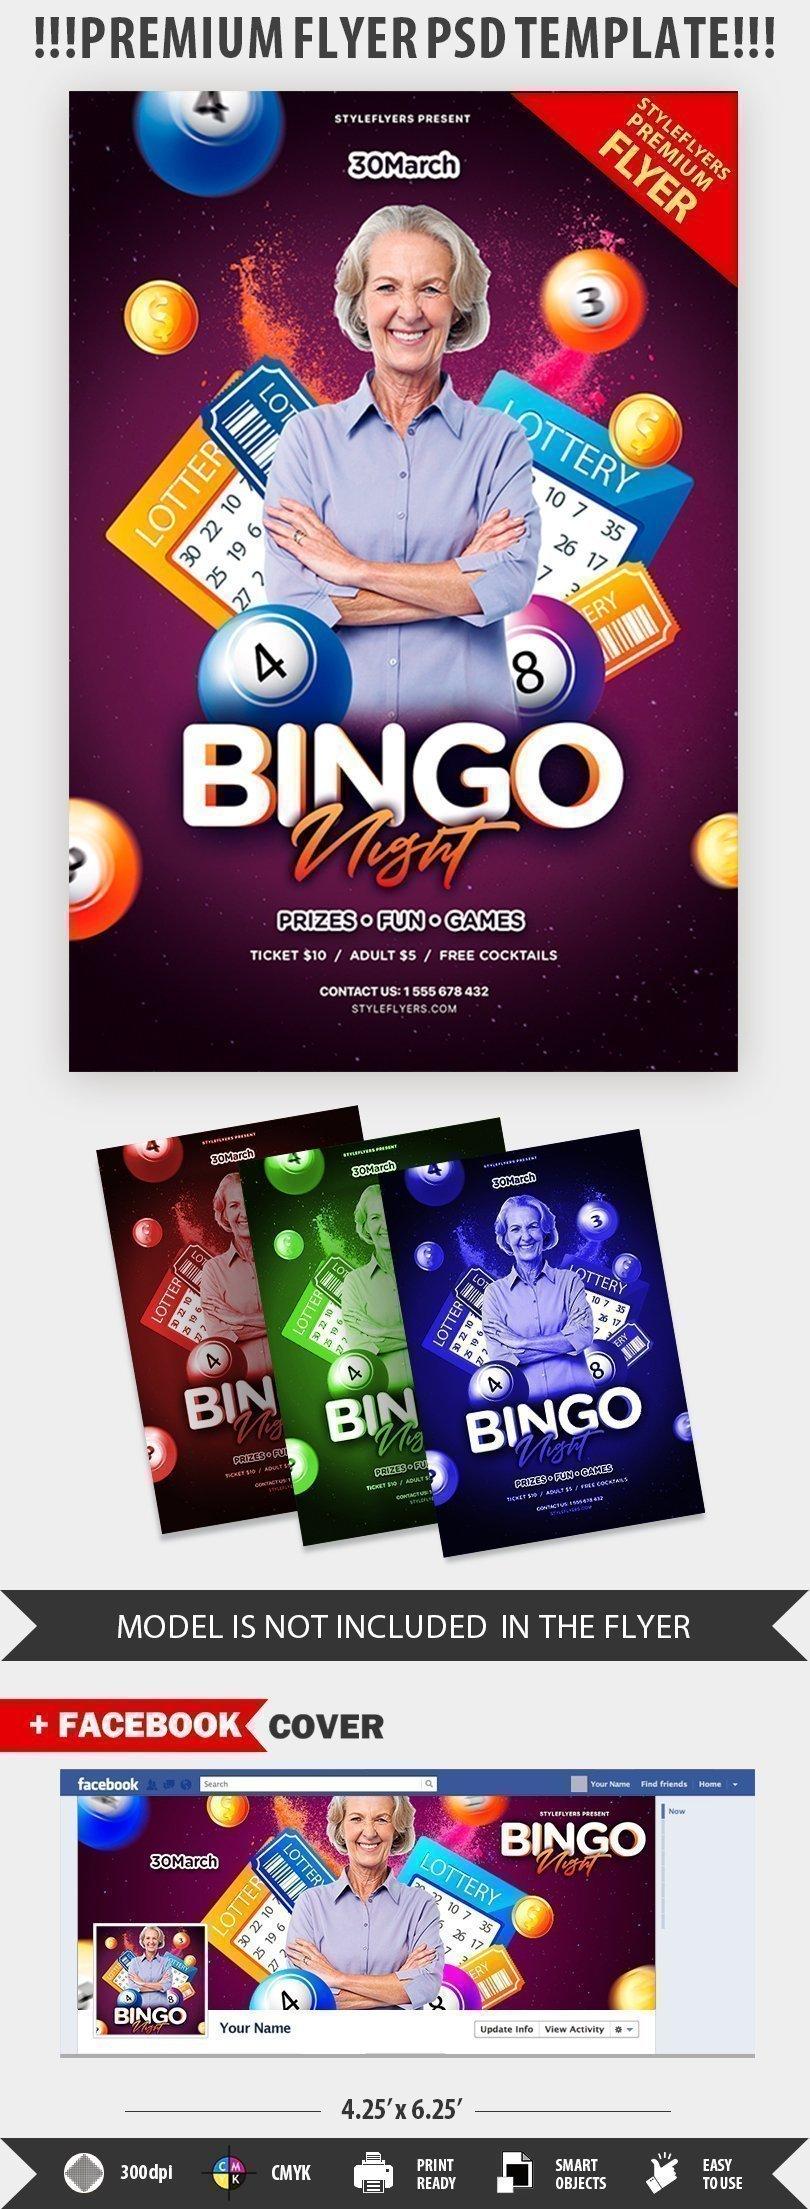 preview_bingo